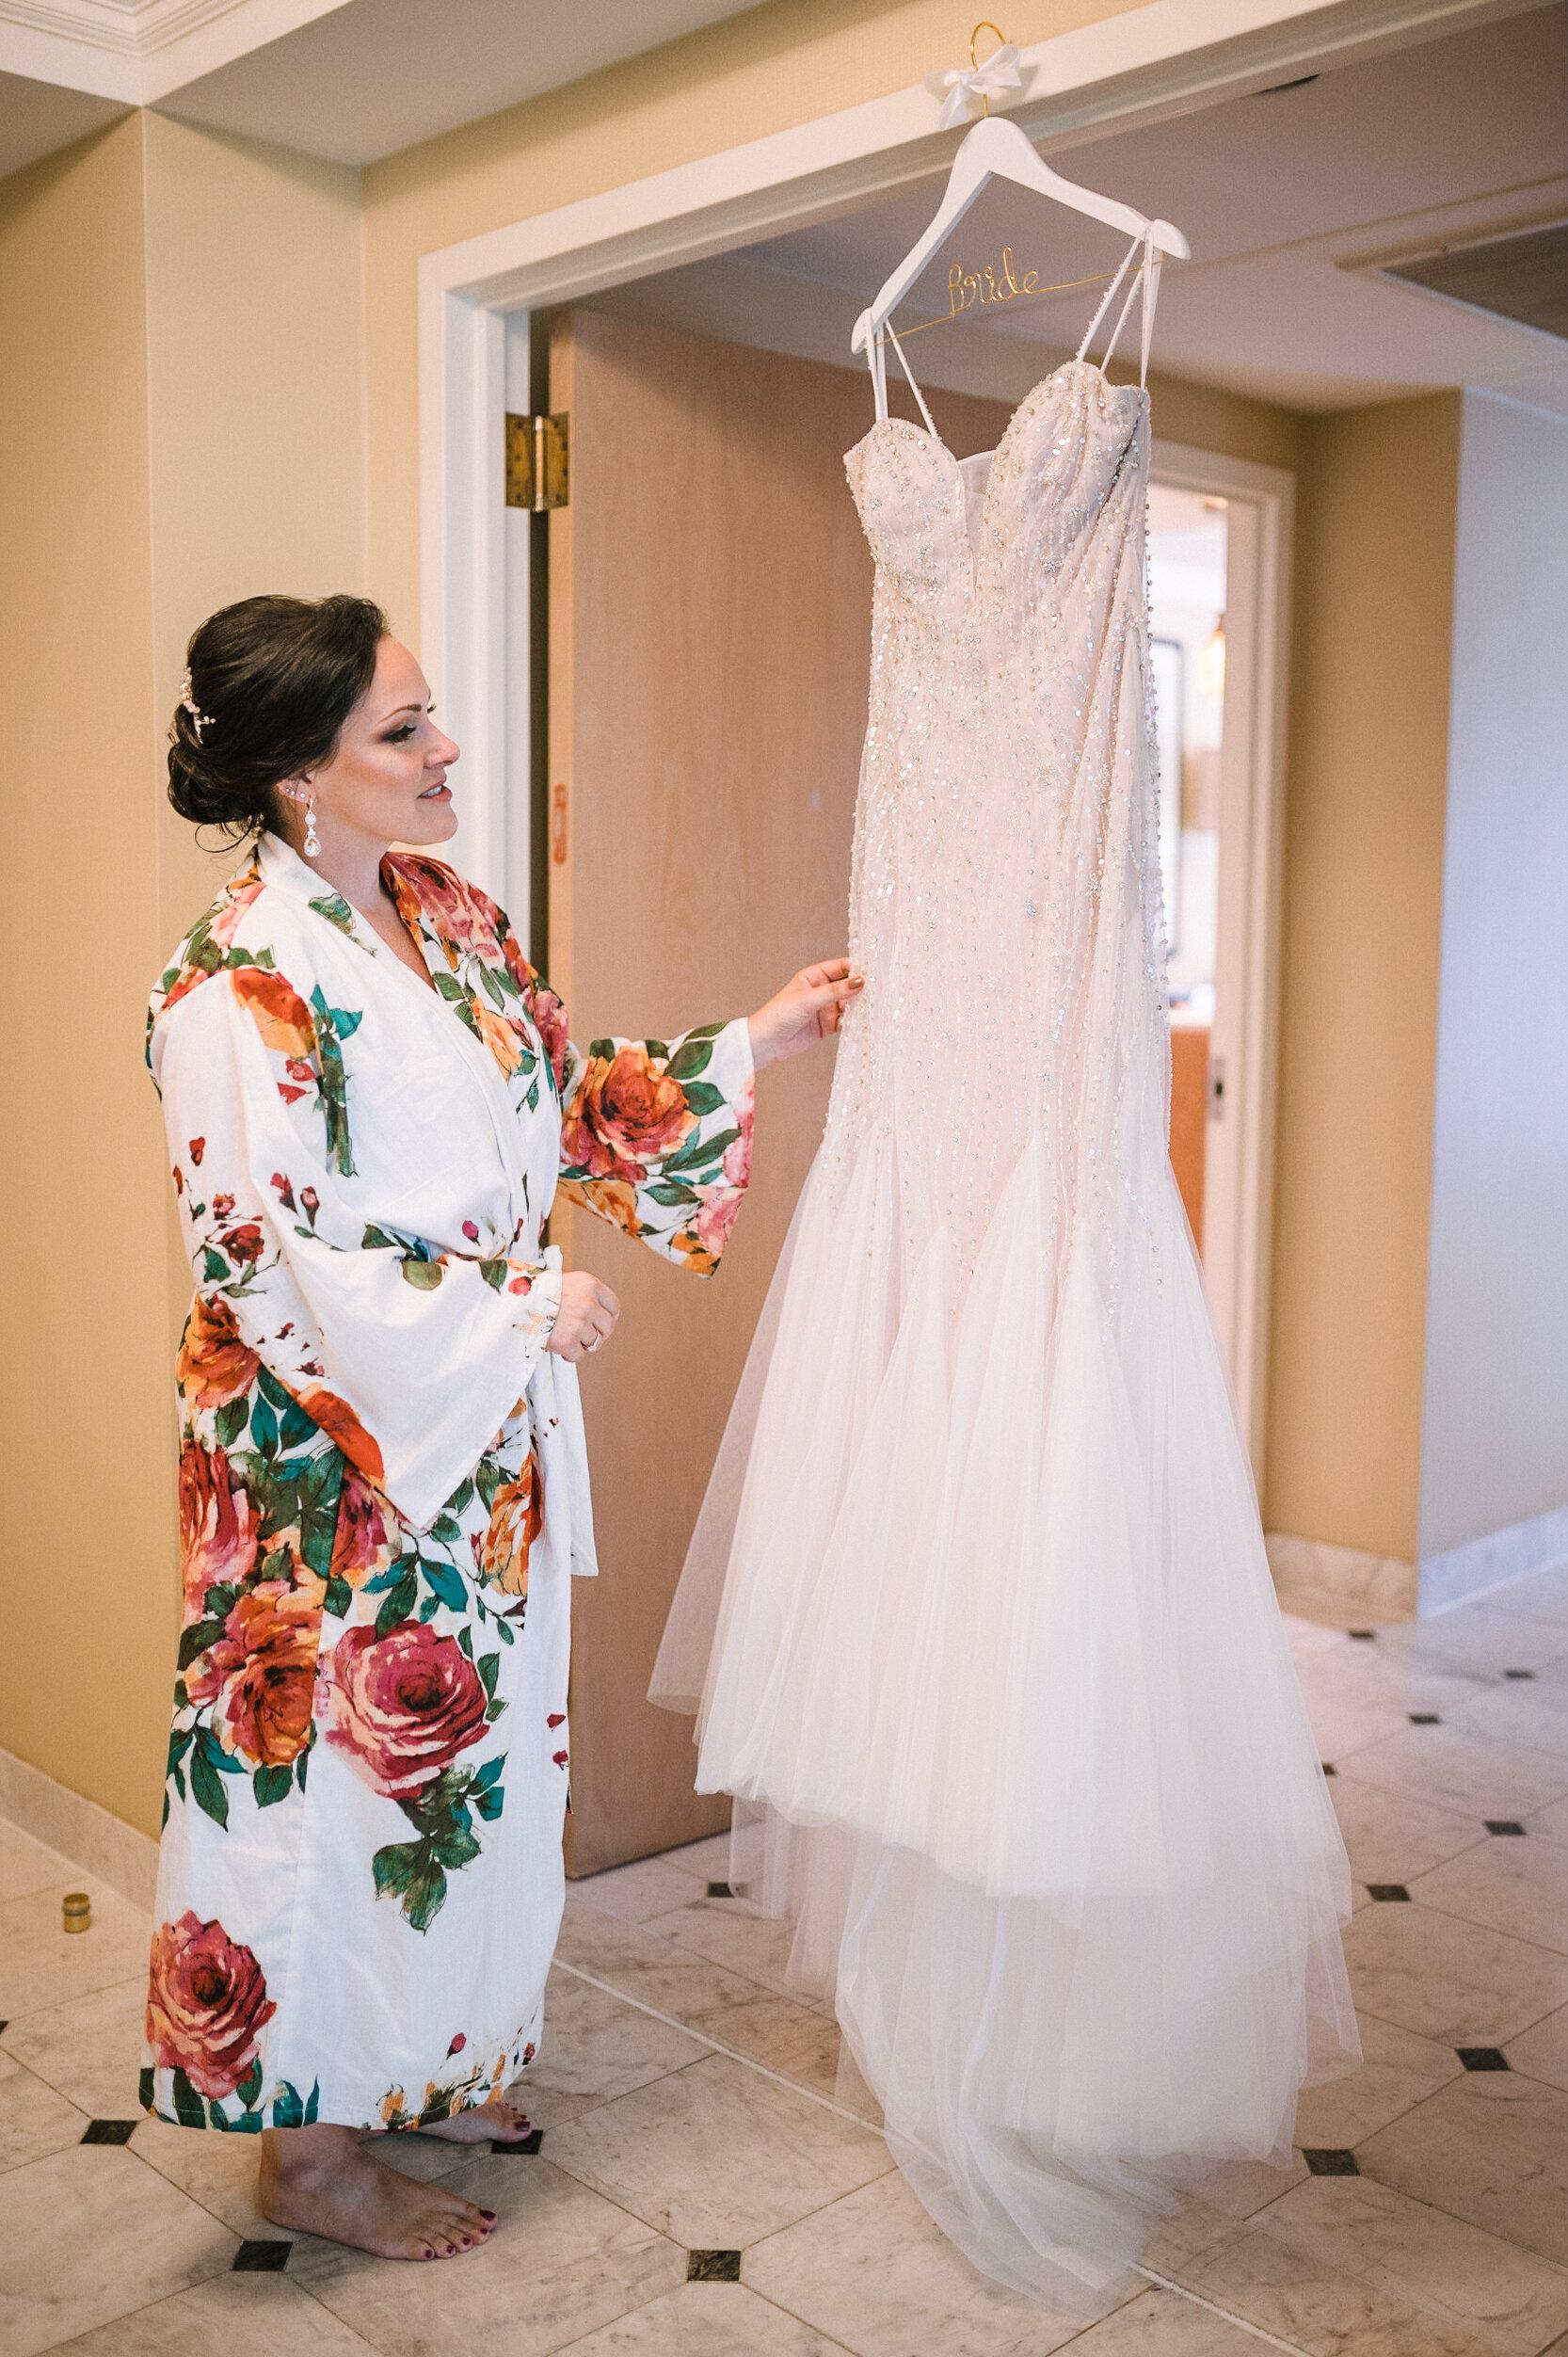 bride admiring her wedding dress at Westfields Golf Club